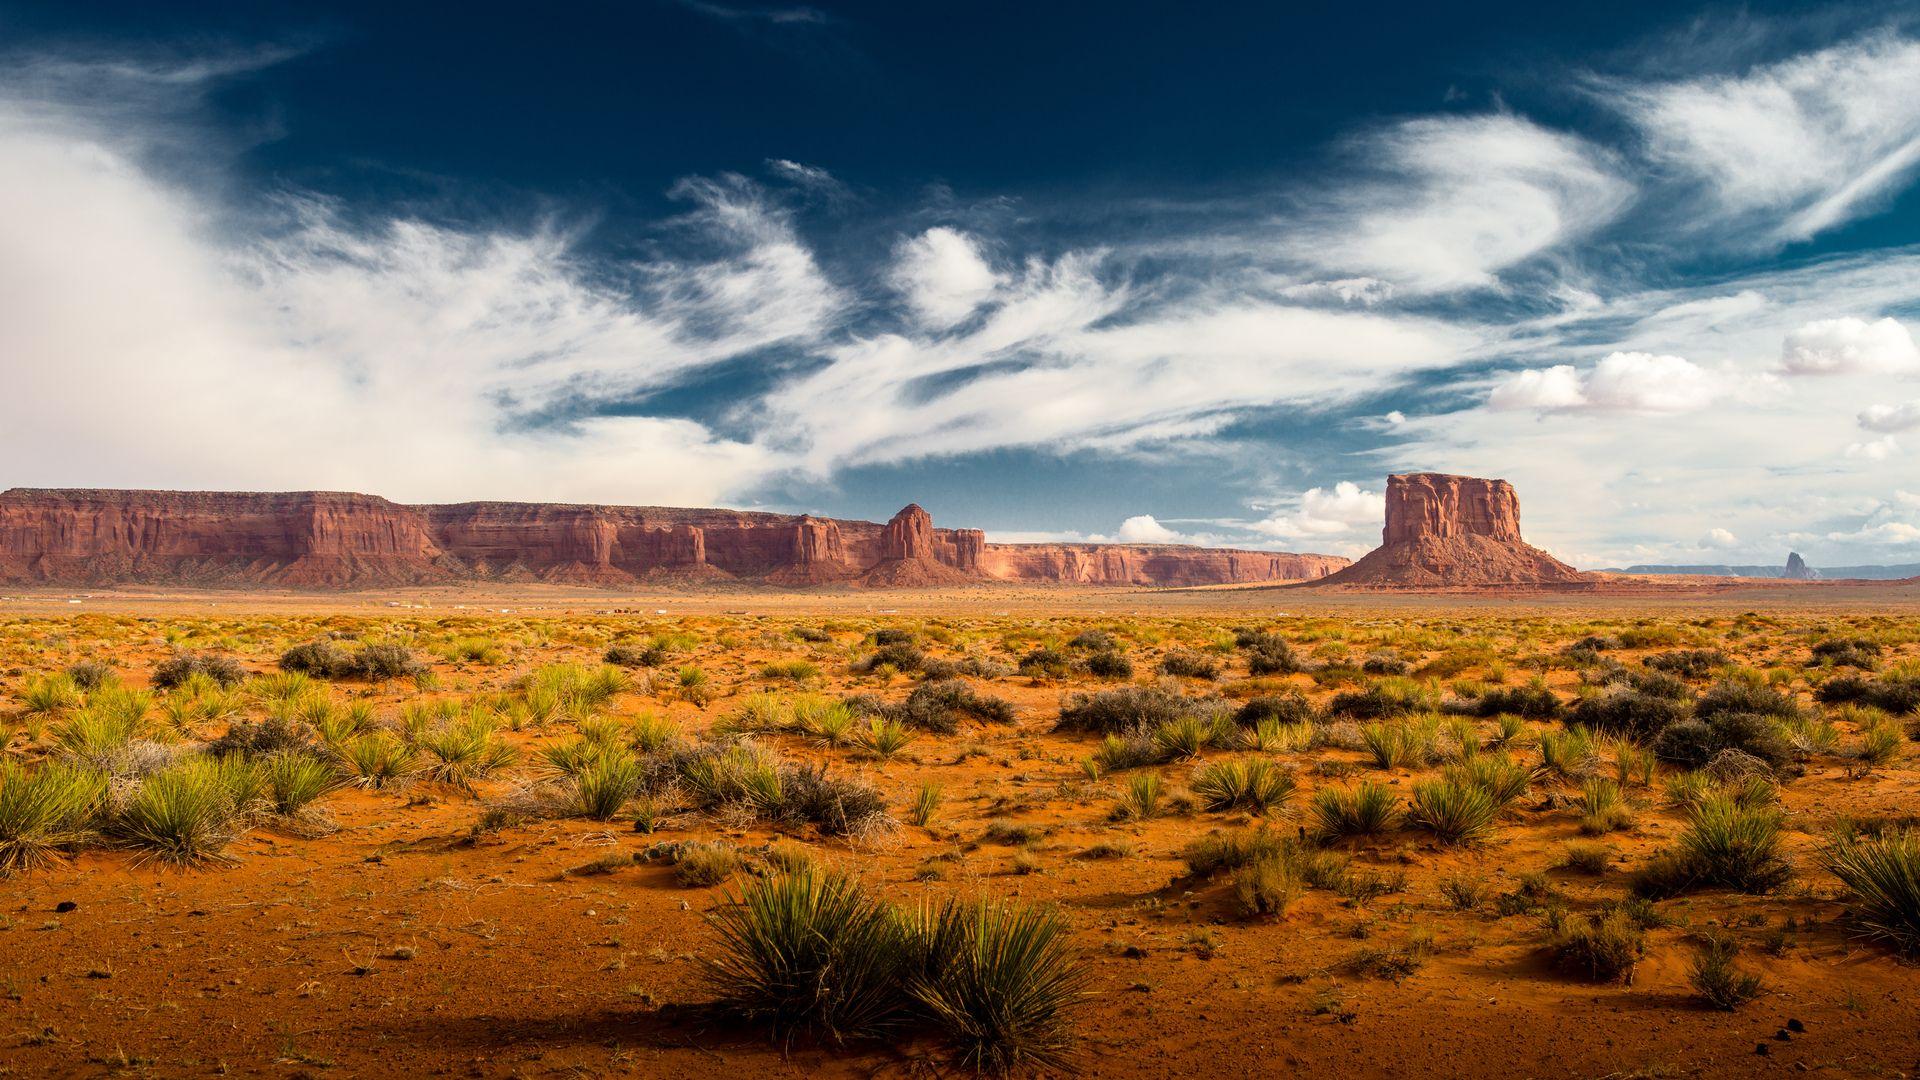 Desert Foothills Landscape wallpaper picture